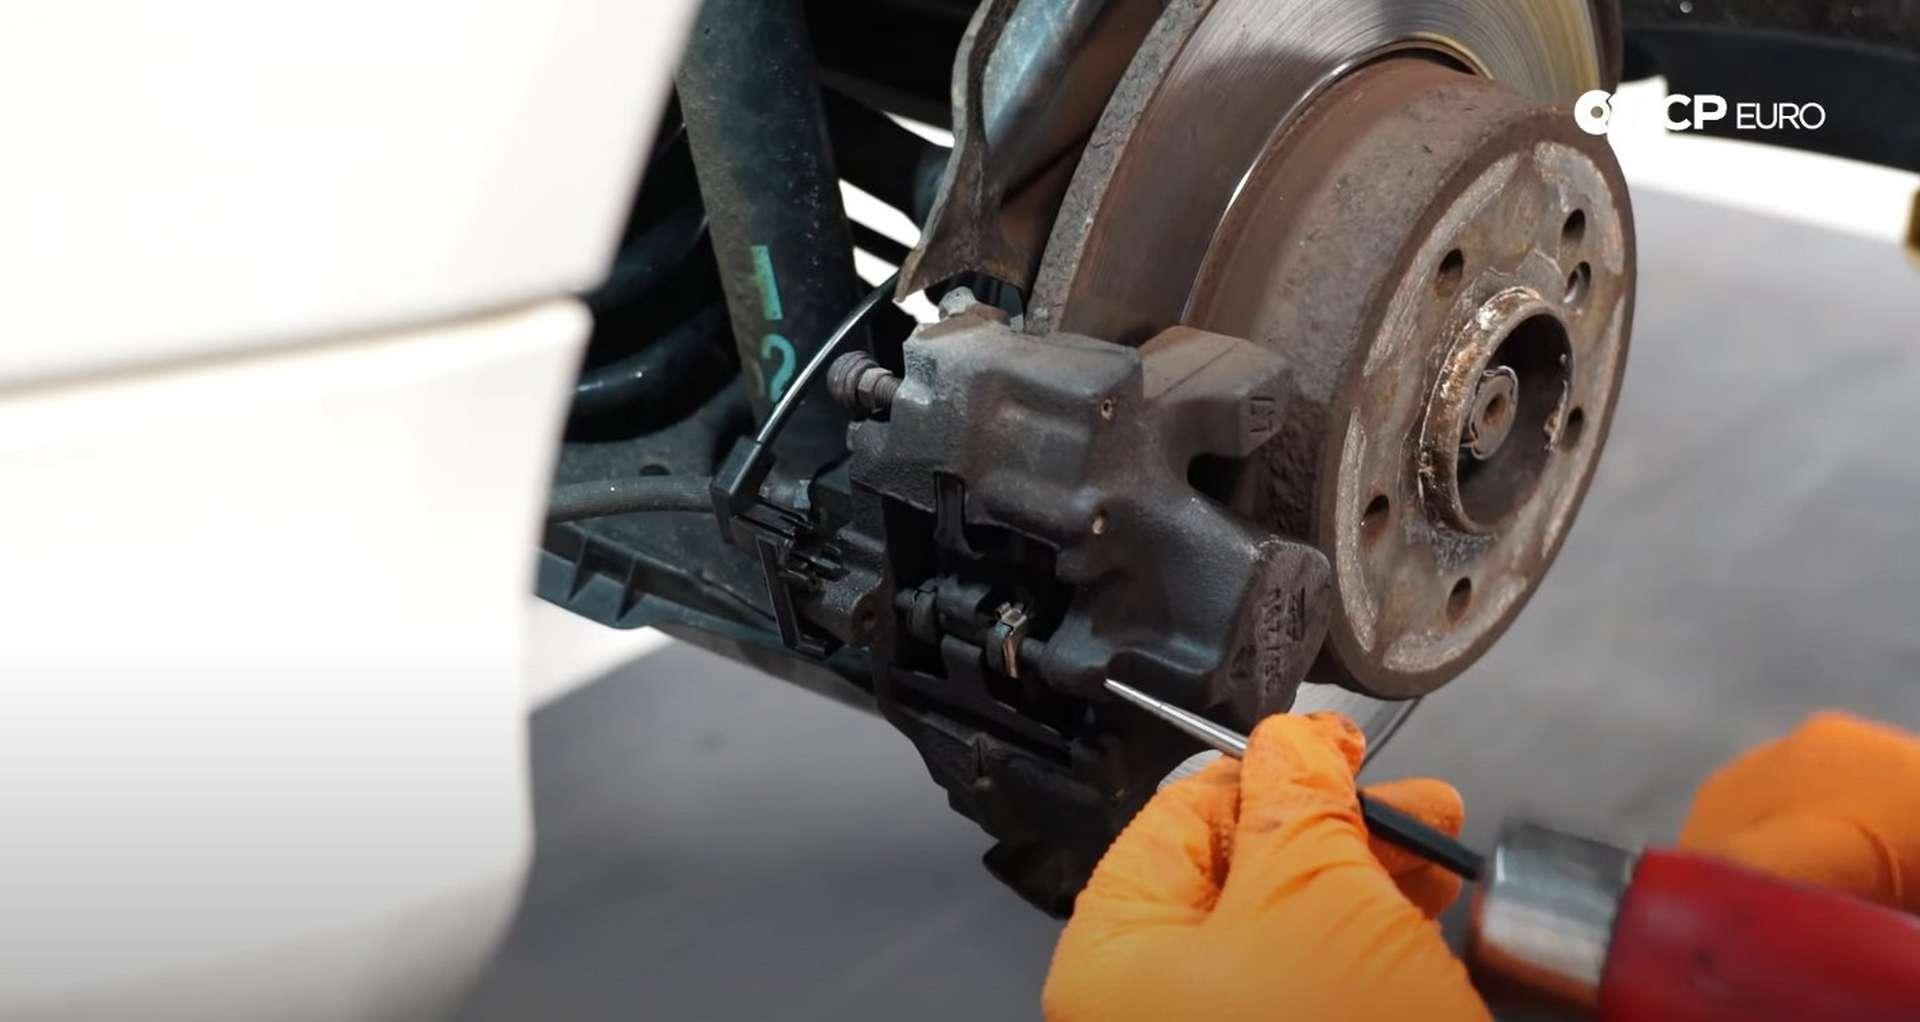 03-DIY-Mercedes-W203-Rear-Brake-Service_Removing-Caliper